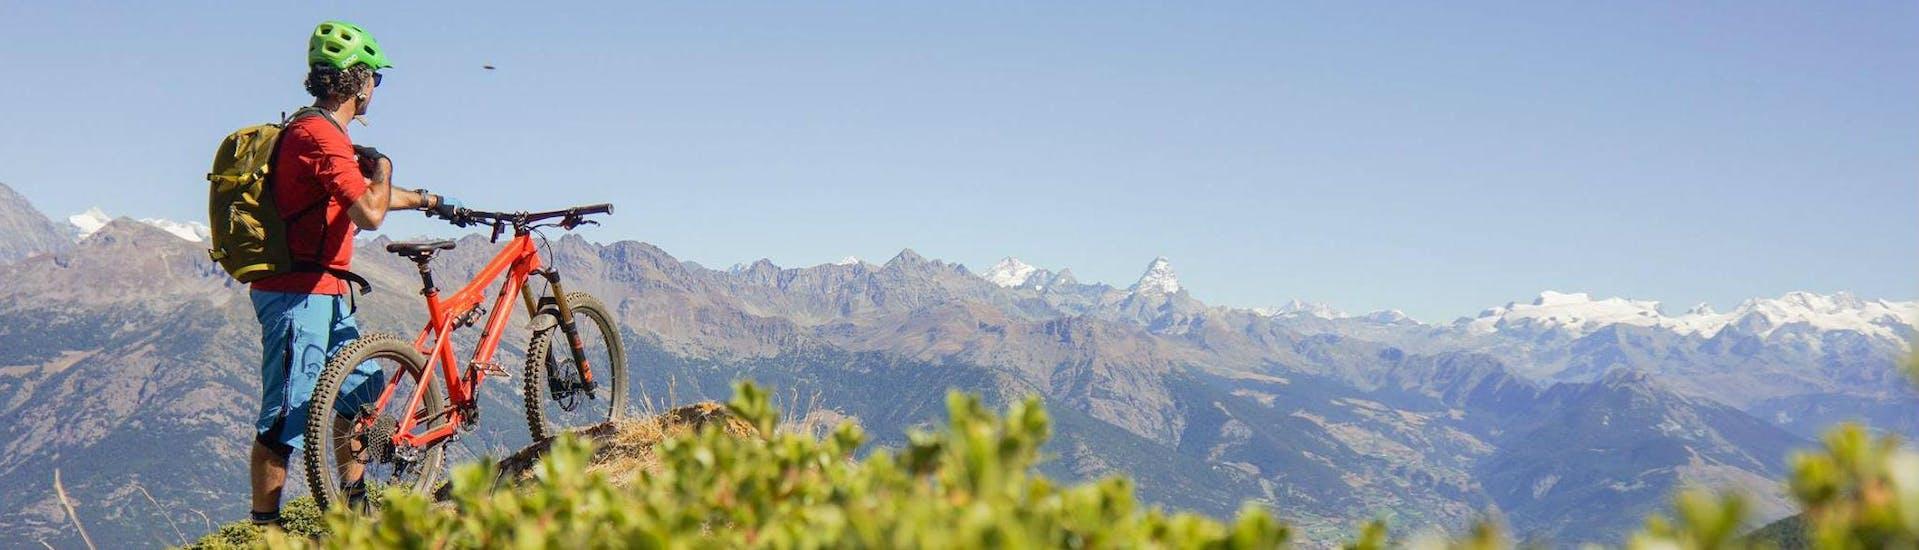 Mountain Bike Enduro Training - Eschach